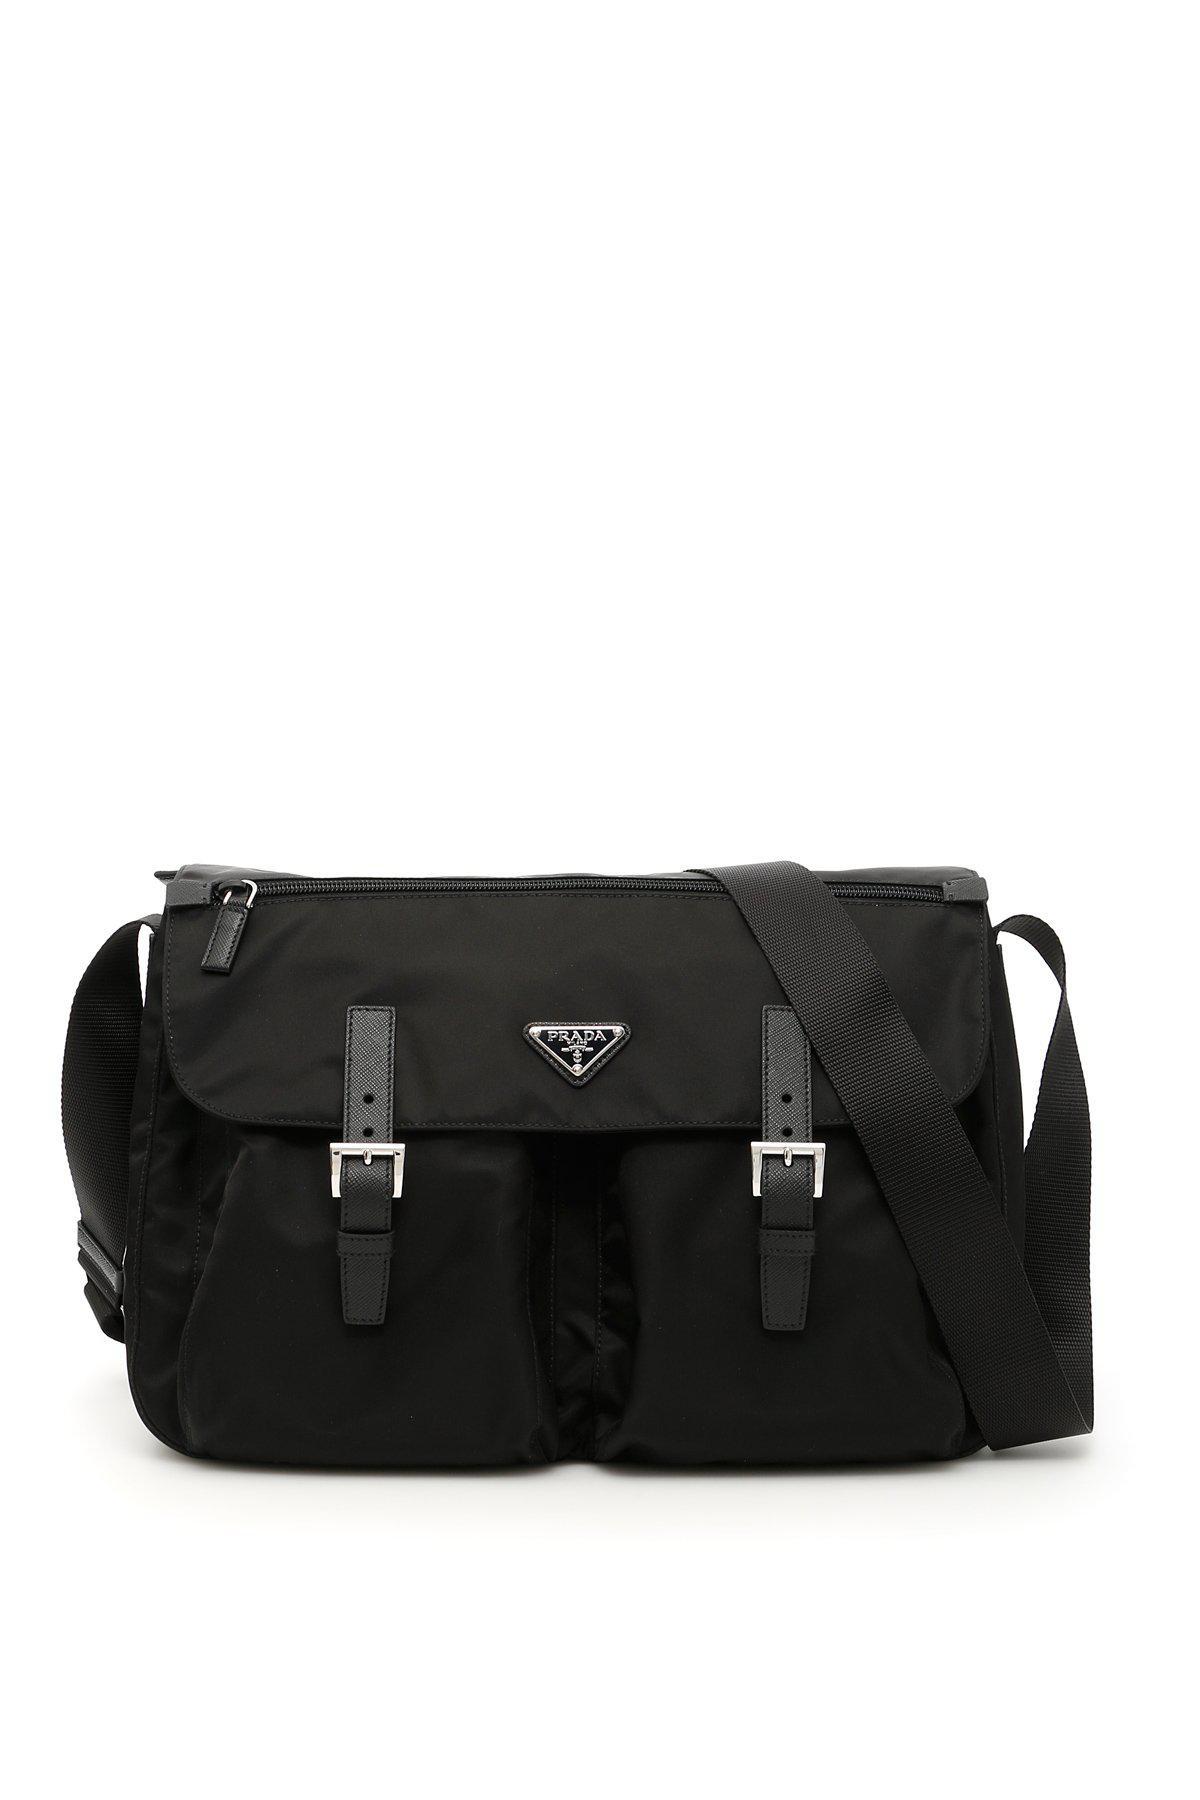 Lyst - Prada Buckled Messenger Bag in Black for Men 9bf43cd3c265d